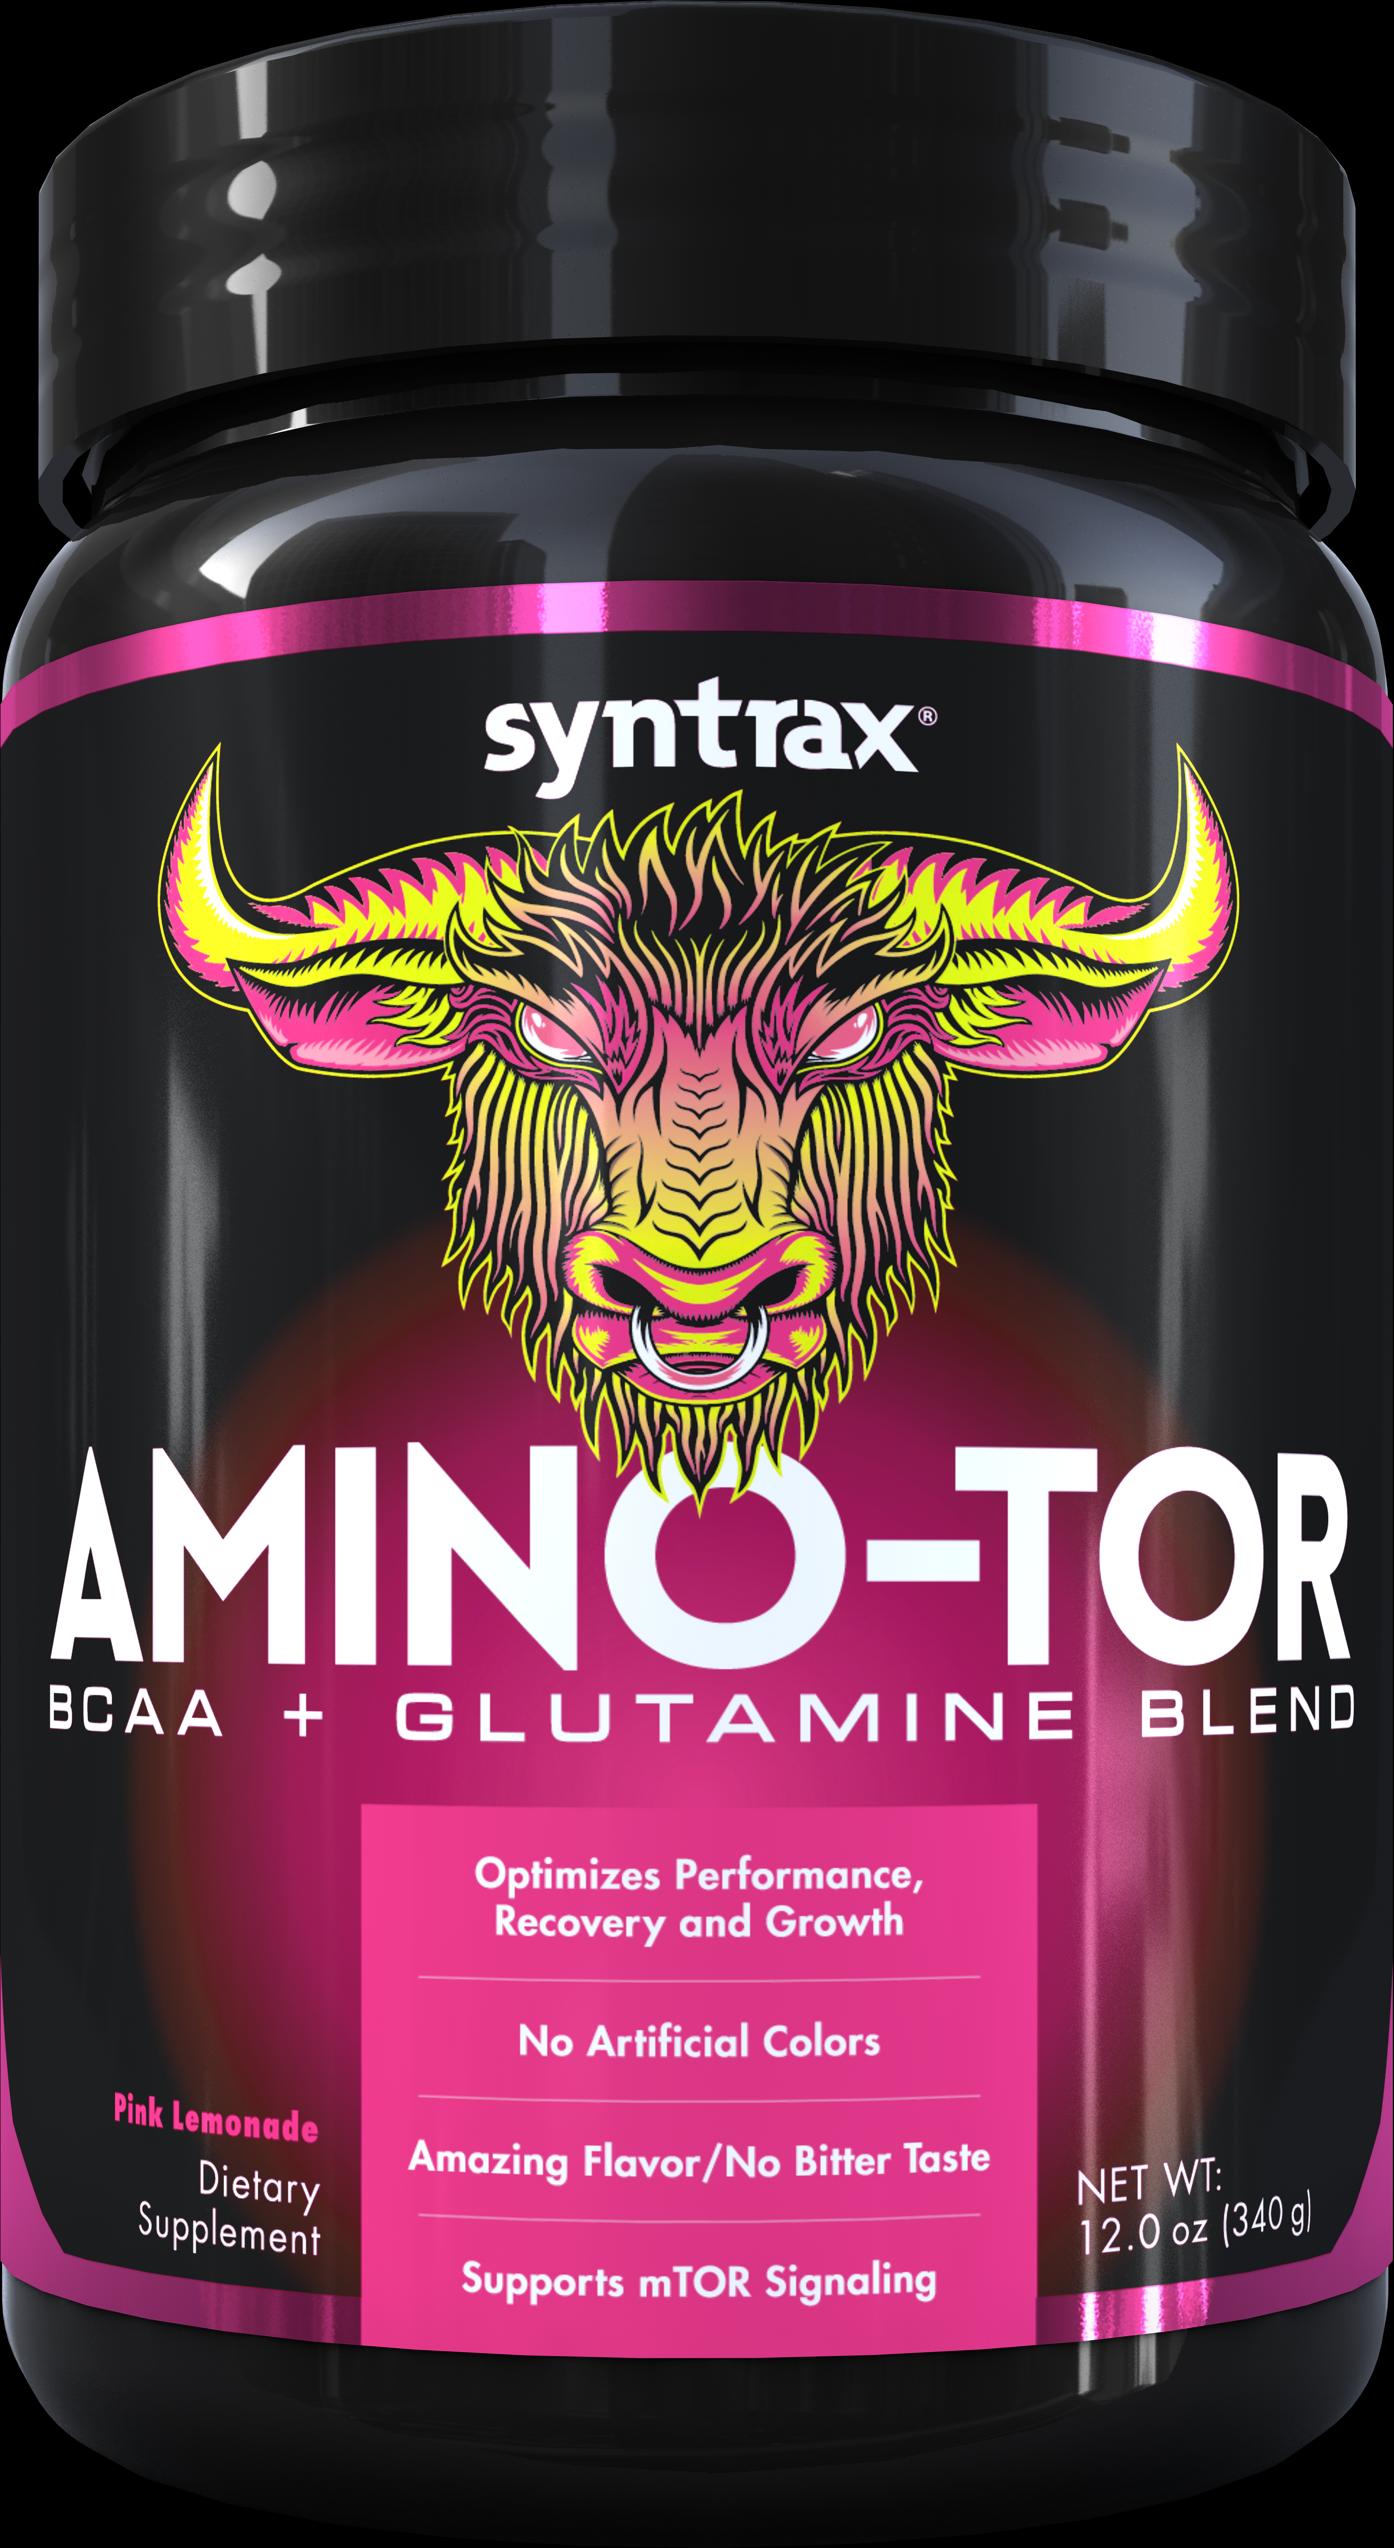 Syntrax Amino-tor - Pink Lemonade 340 g